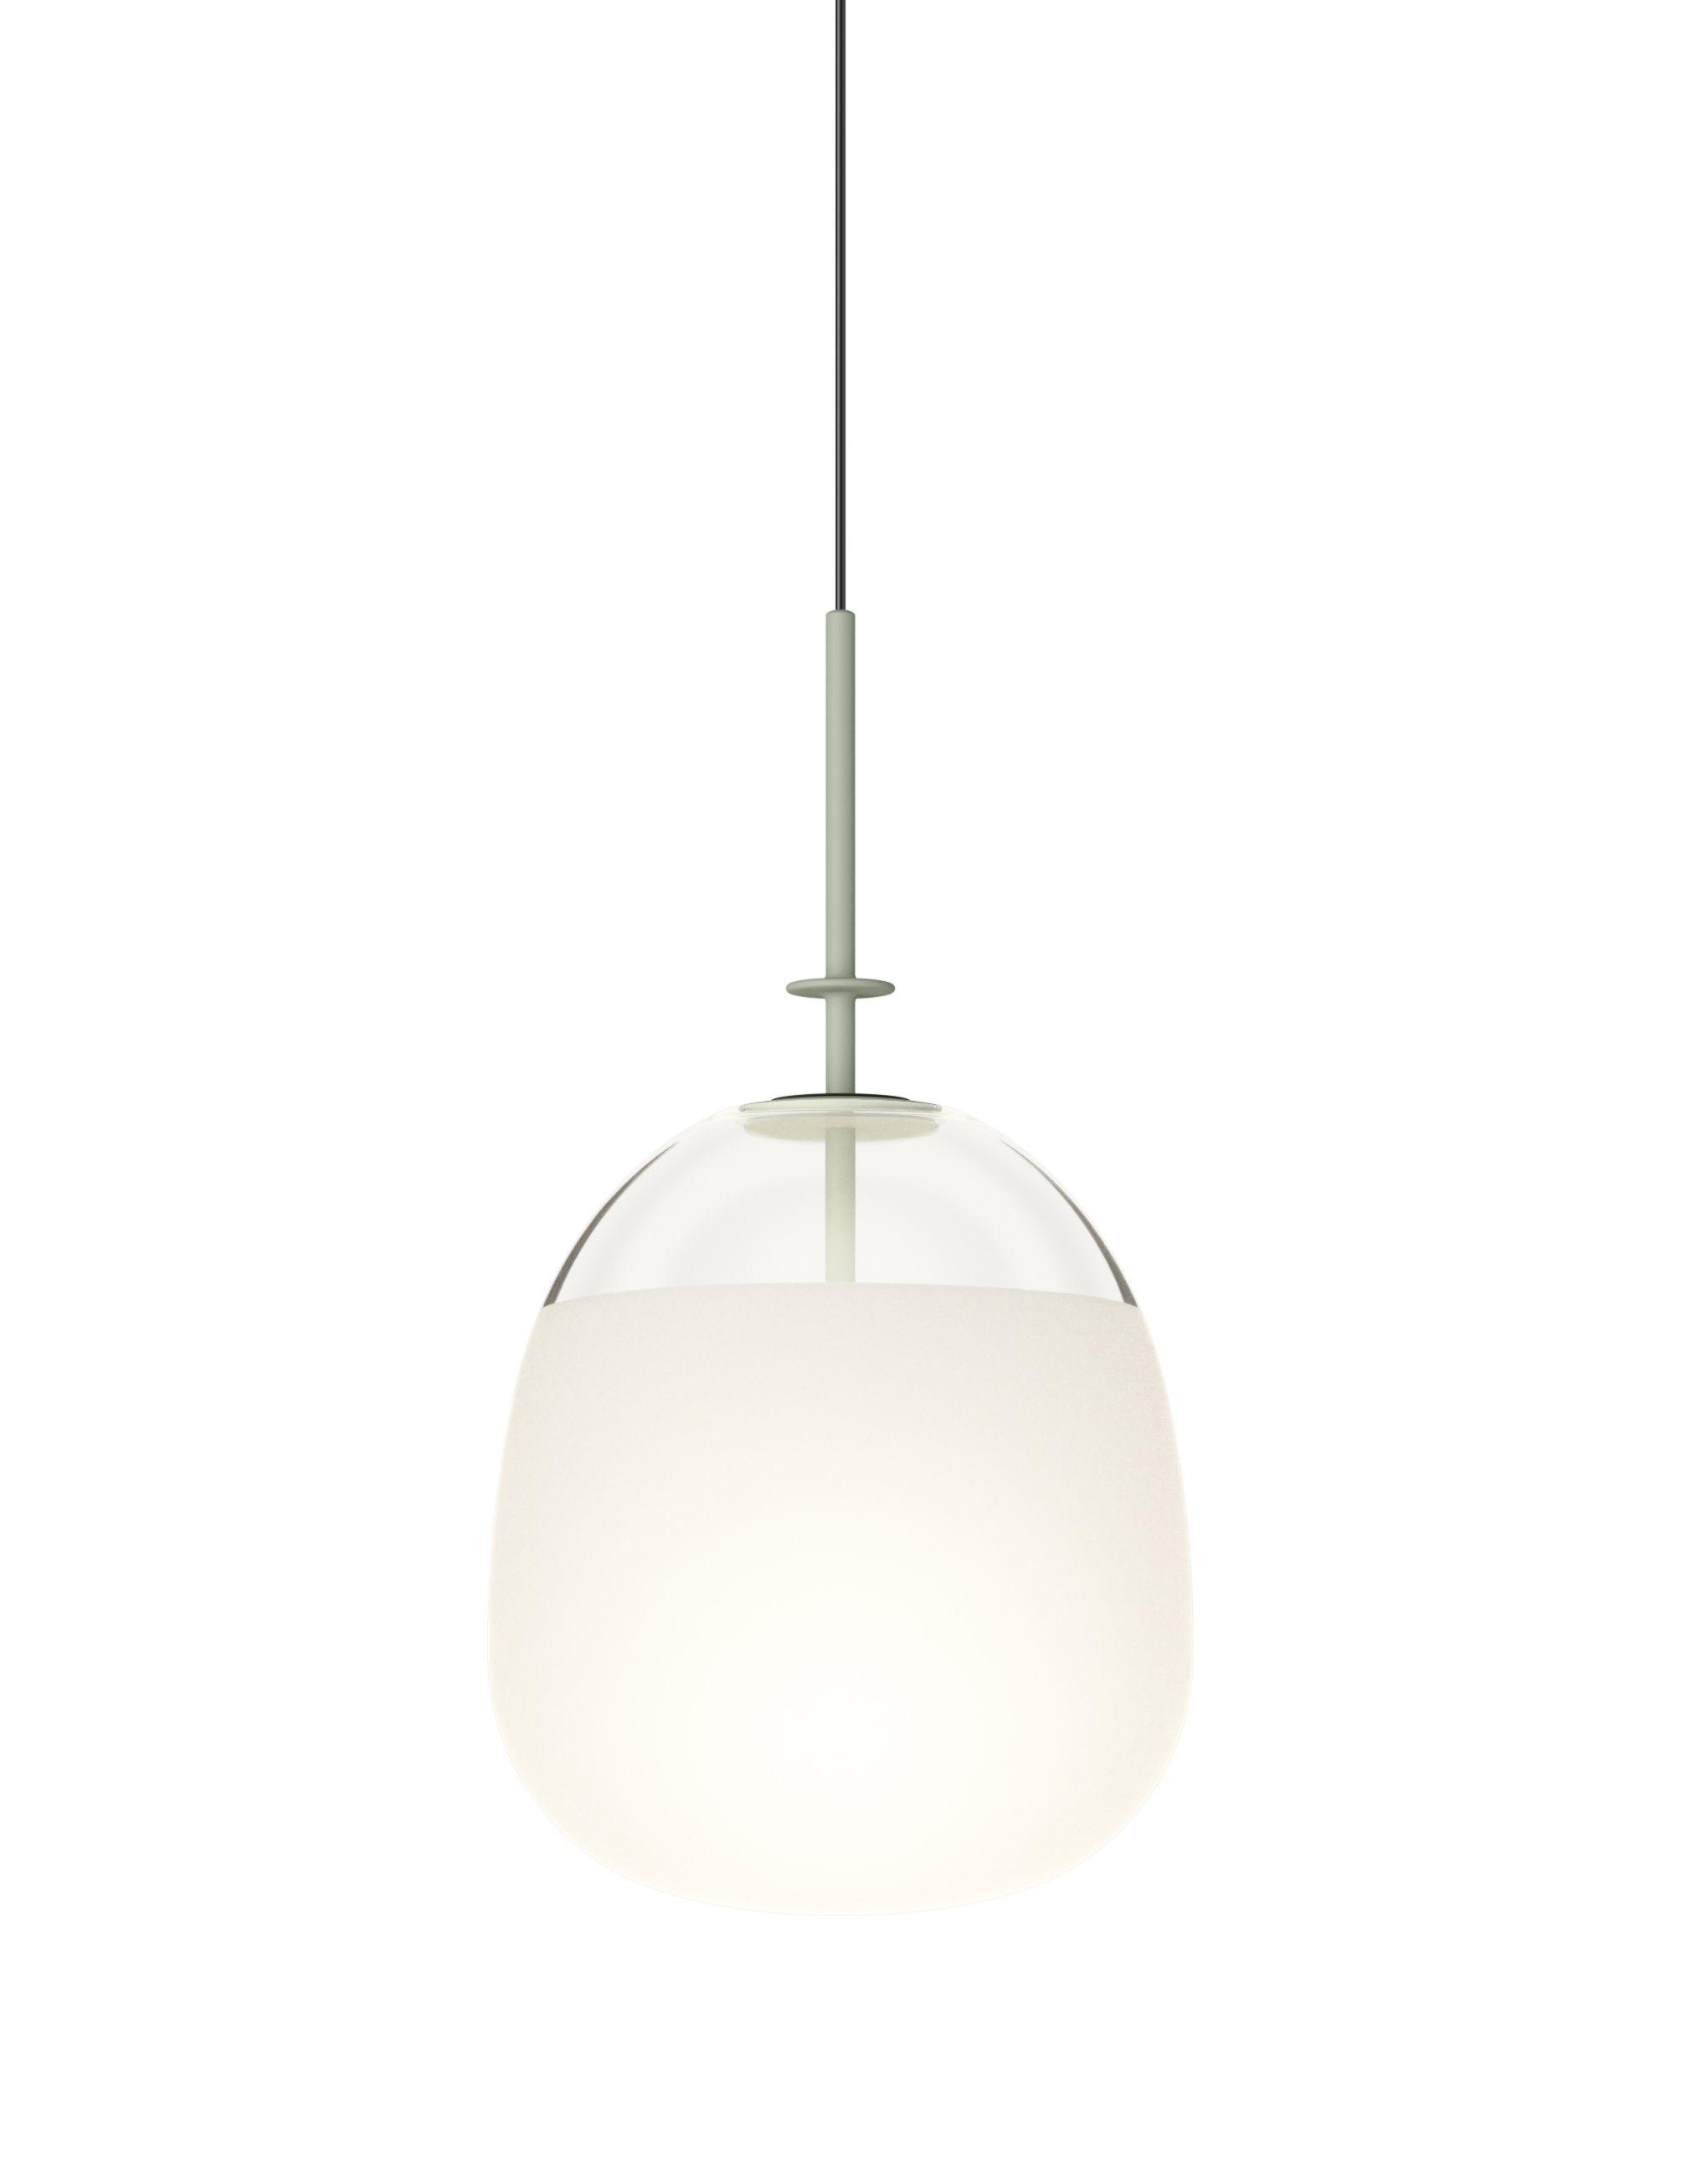 Lighting - Pendant Lighting - Tempo Globe Pendant - / LED - Ø 24 cm by Vibia - Green - Blown glass, Varnished aluminium